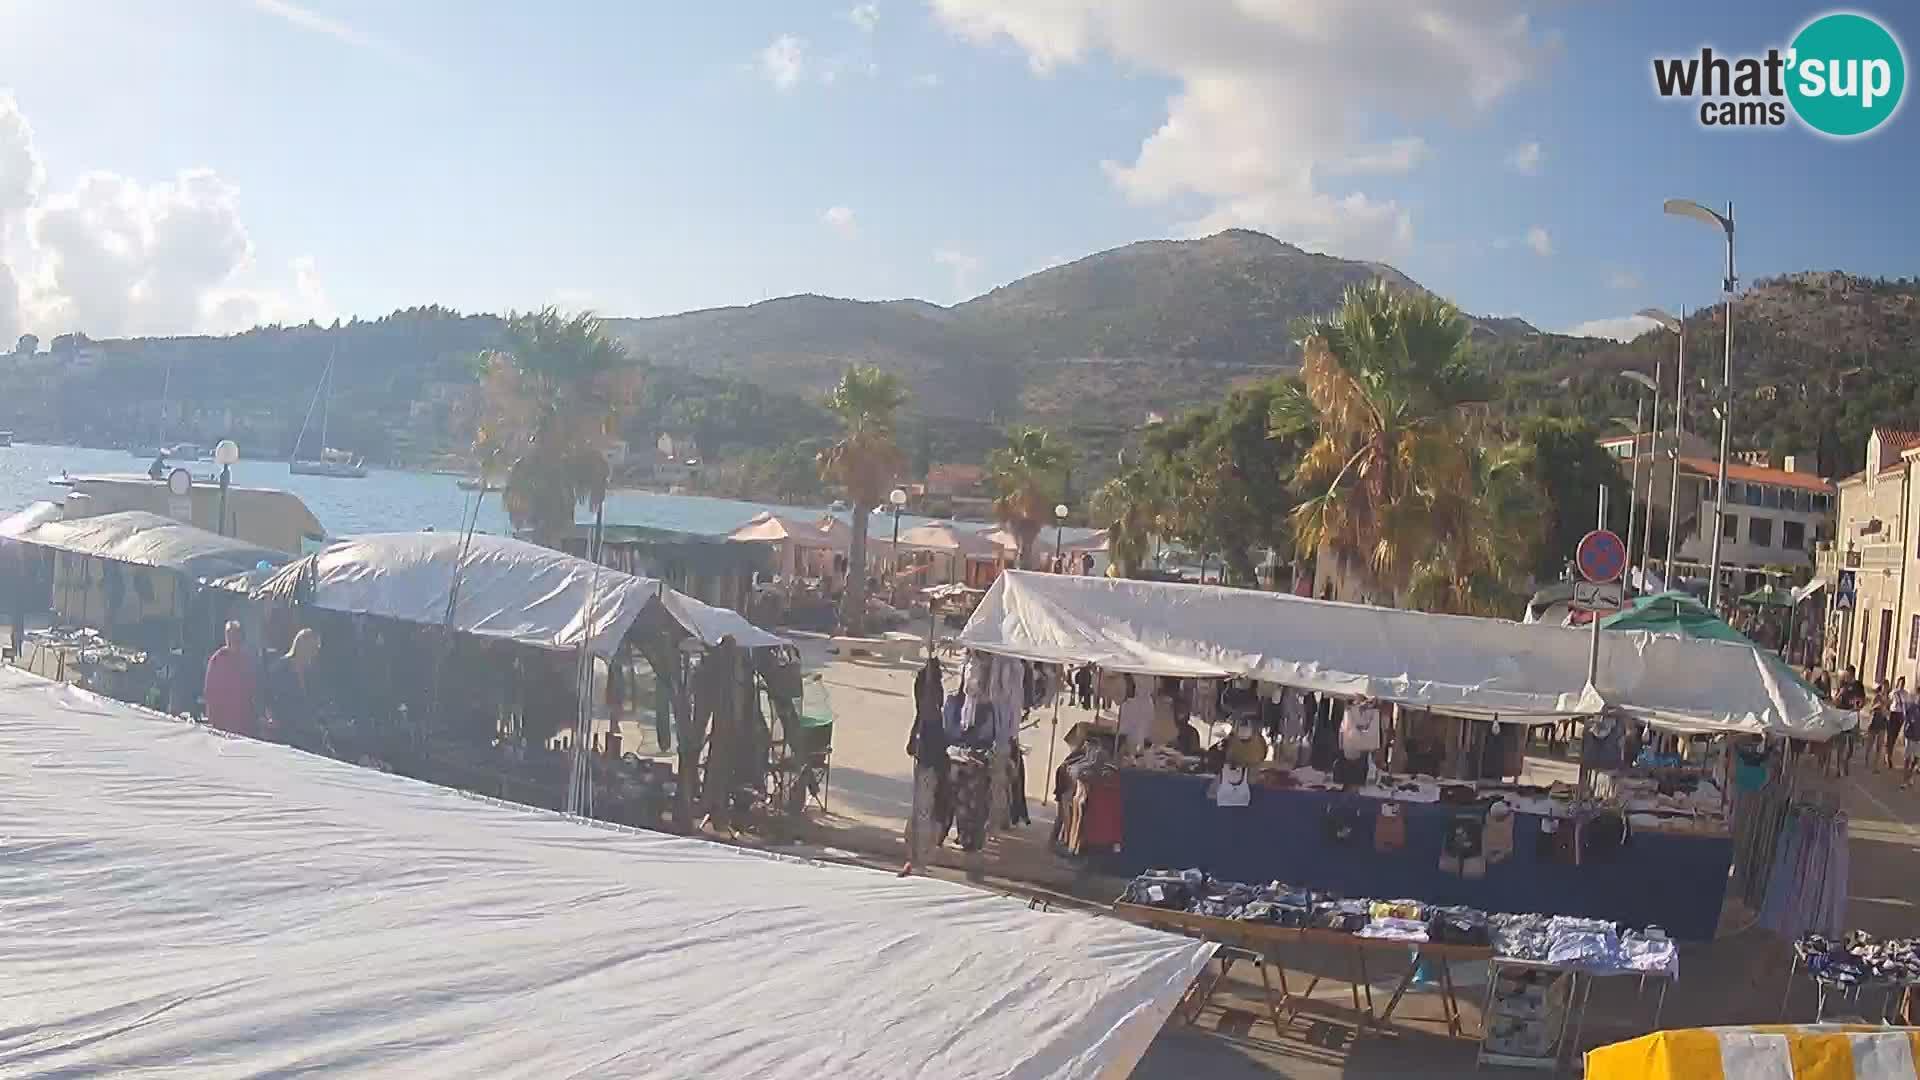 Kamera v živo Slano – Dubrovniško Neretvanska regija – Hrvaška